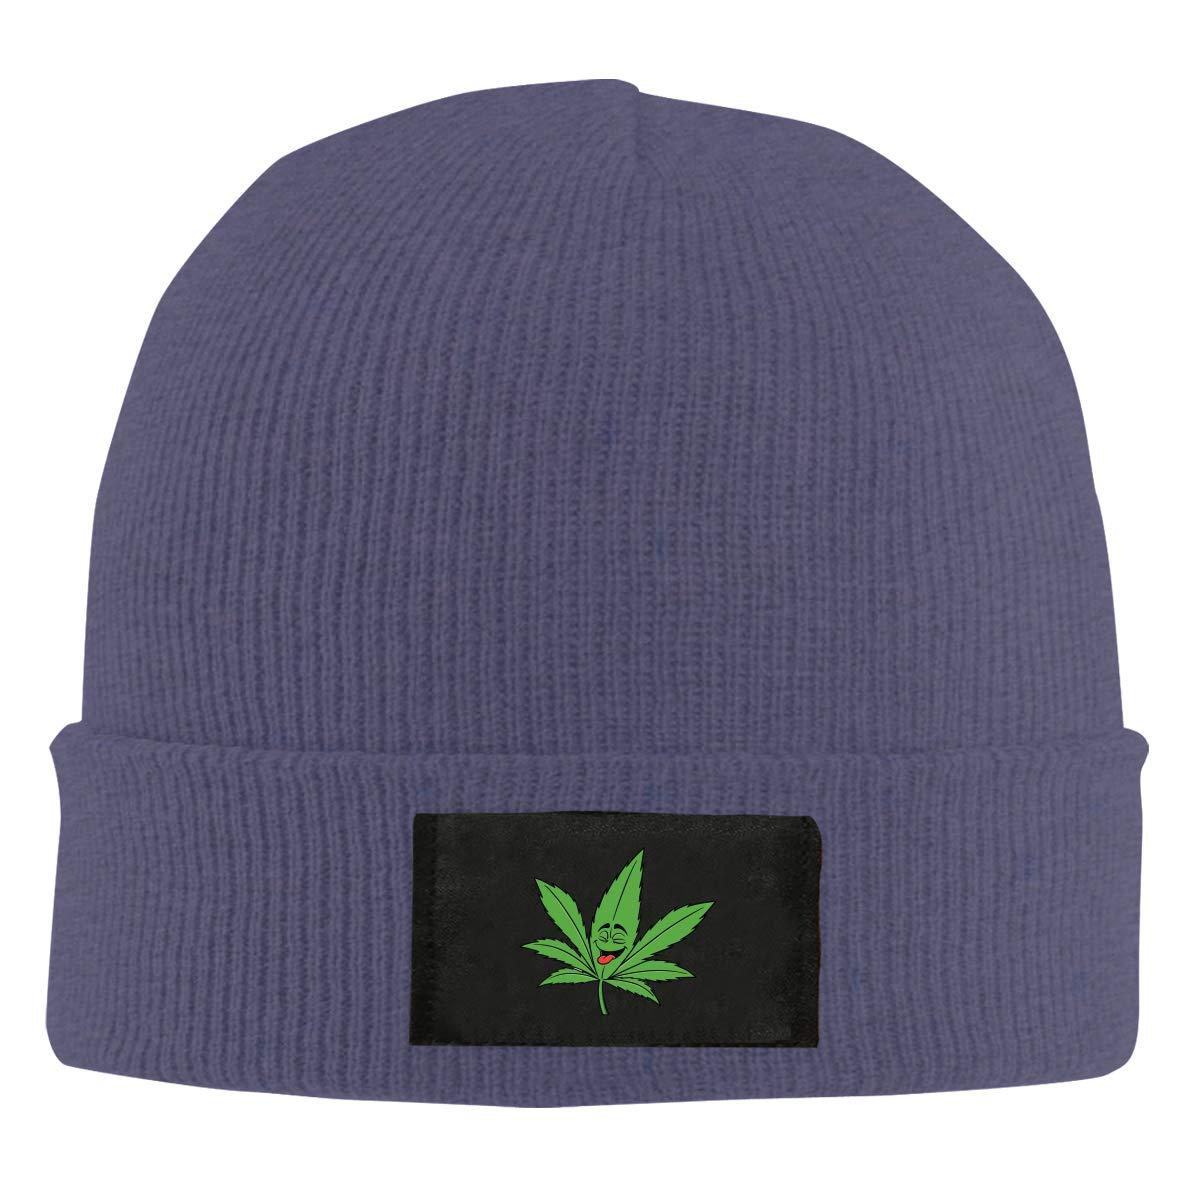 Ganja Leaf Weed Smokers Winter Beanie Hat Knit Hat Cap for Men /& Women